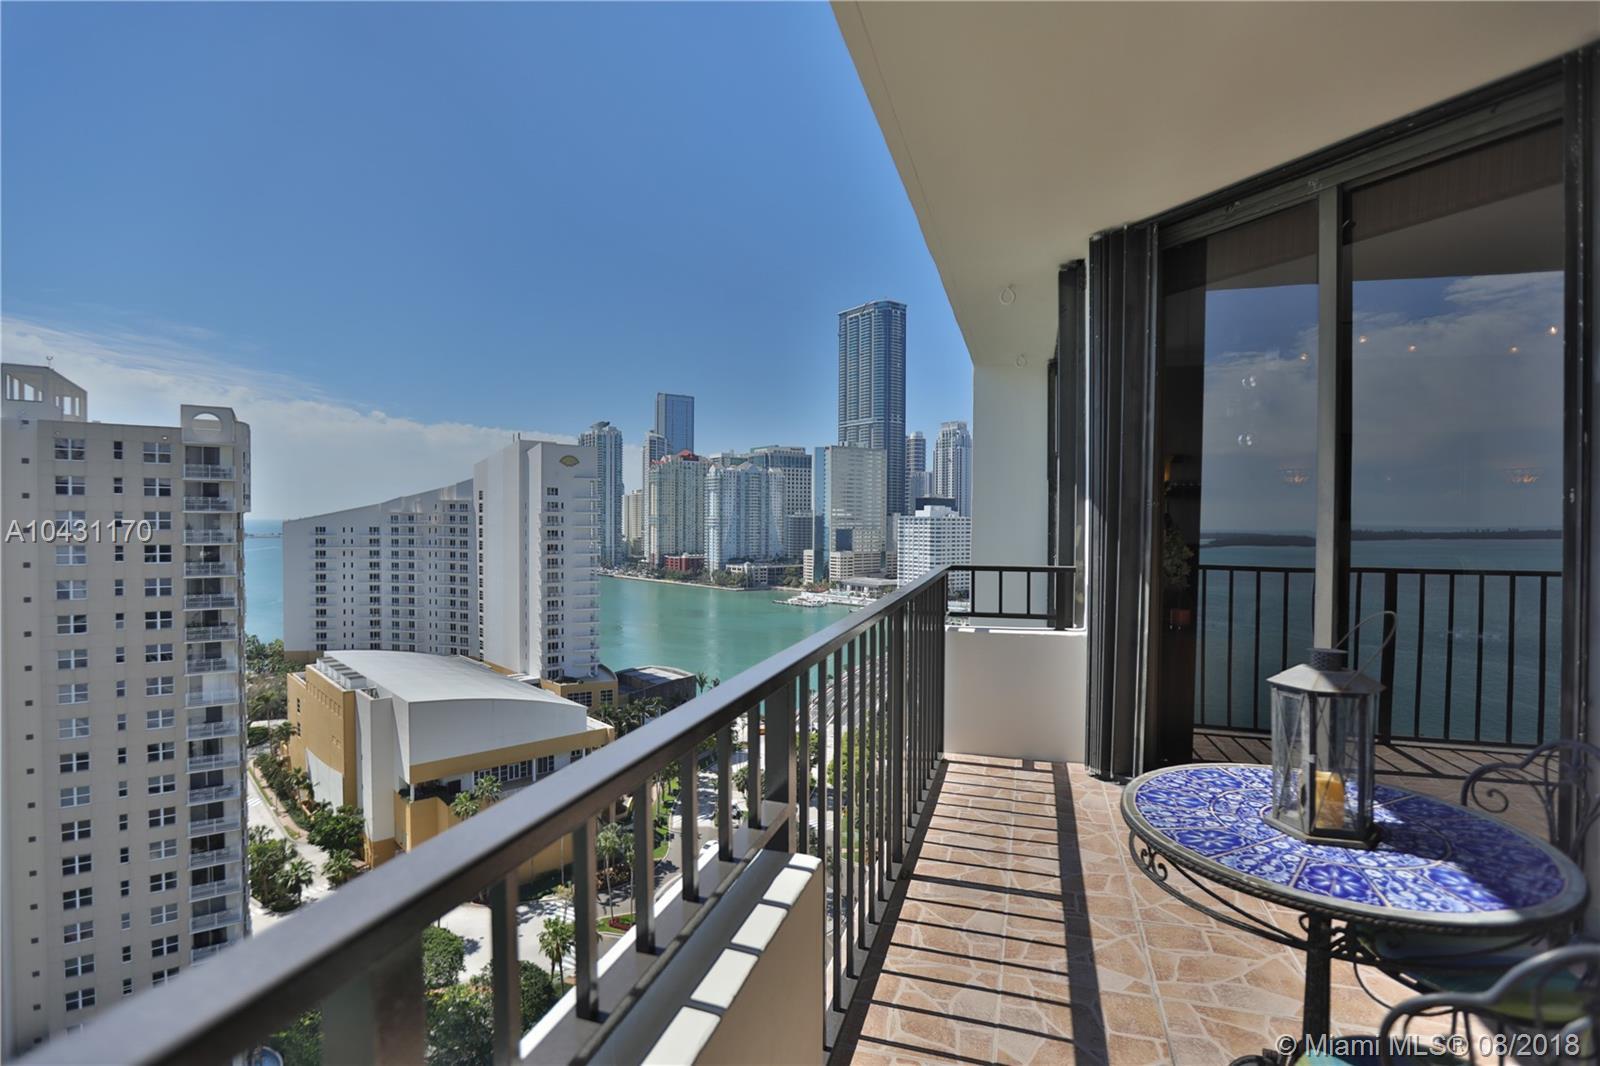 520 Brickell Key Dr. #A2013, Miami FL, 33131